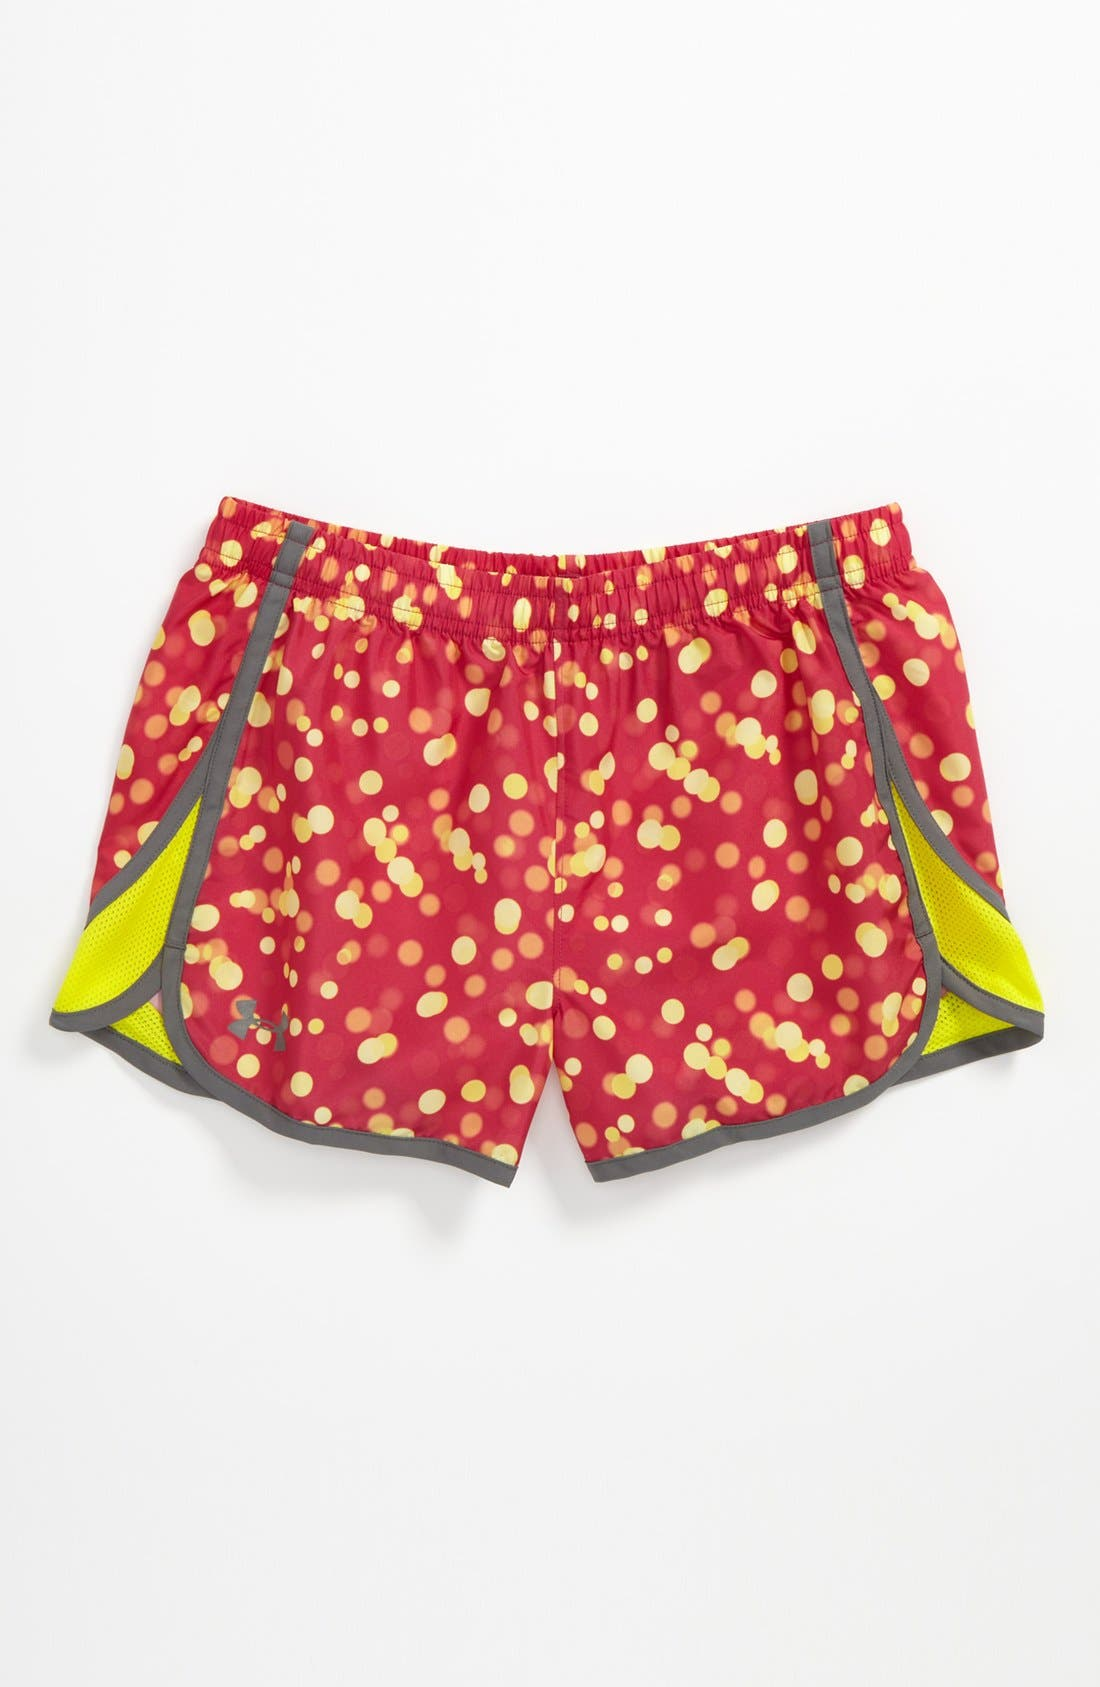 Alternate Image 1 Selected - Under Armour 'Escape' HeatGear® Print Shorts (Big Girls)